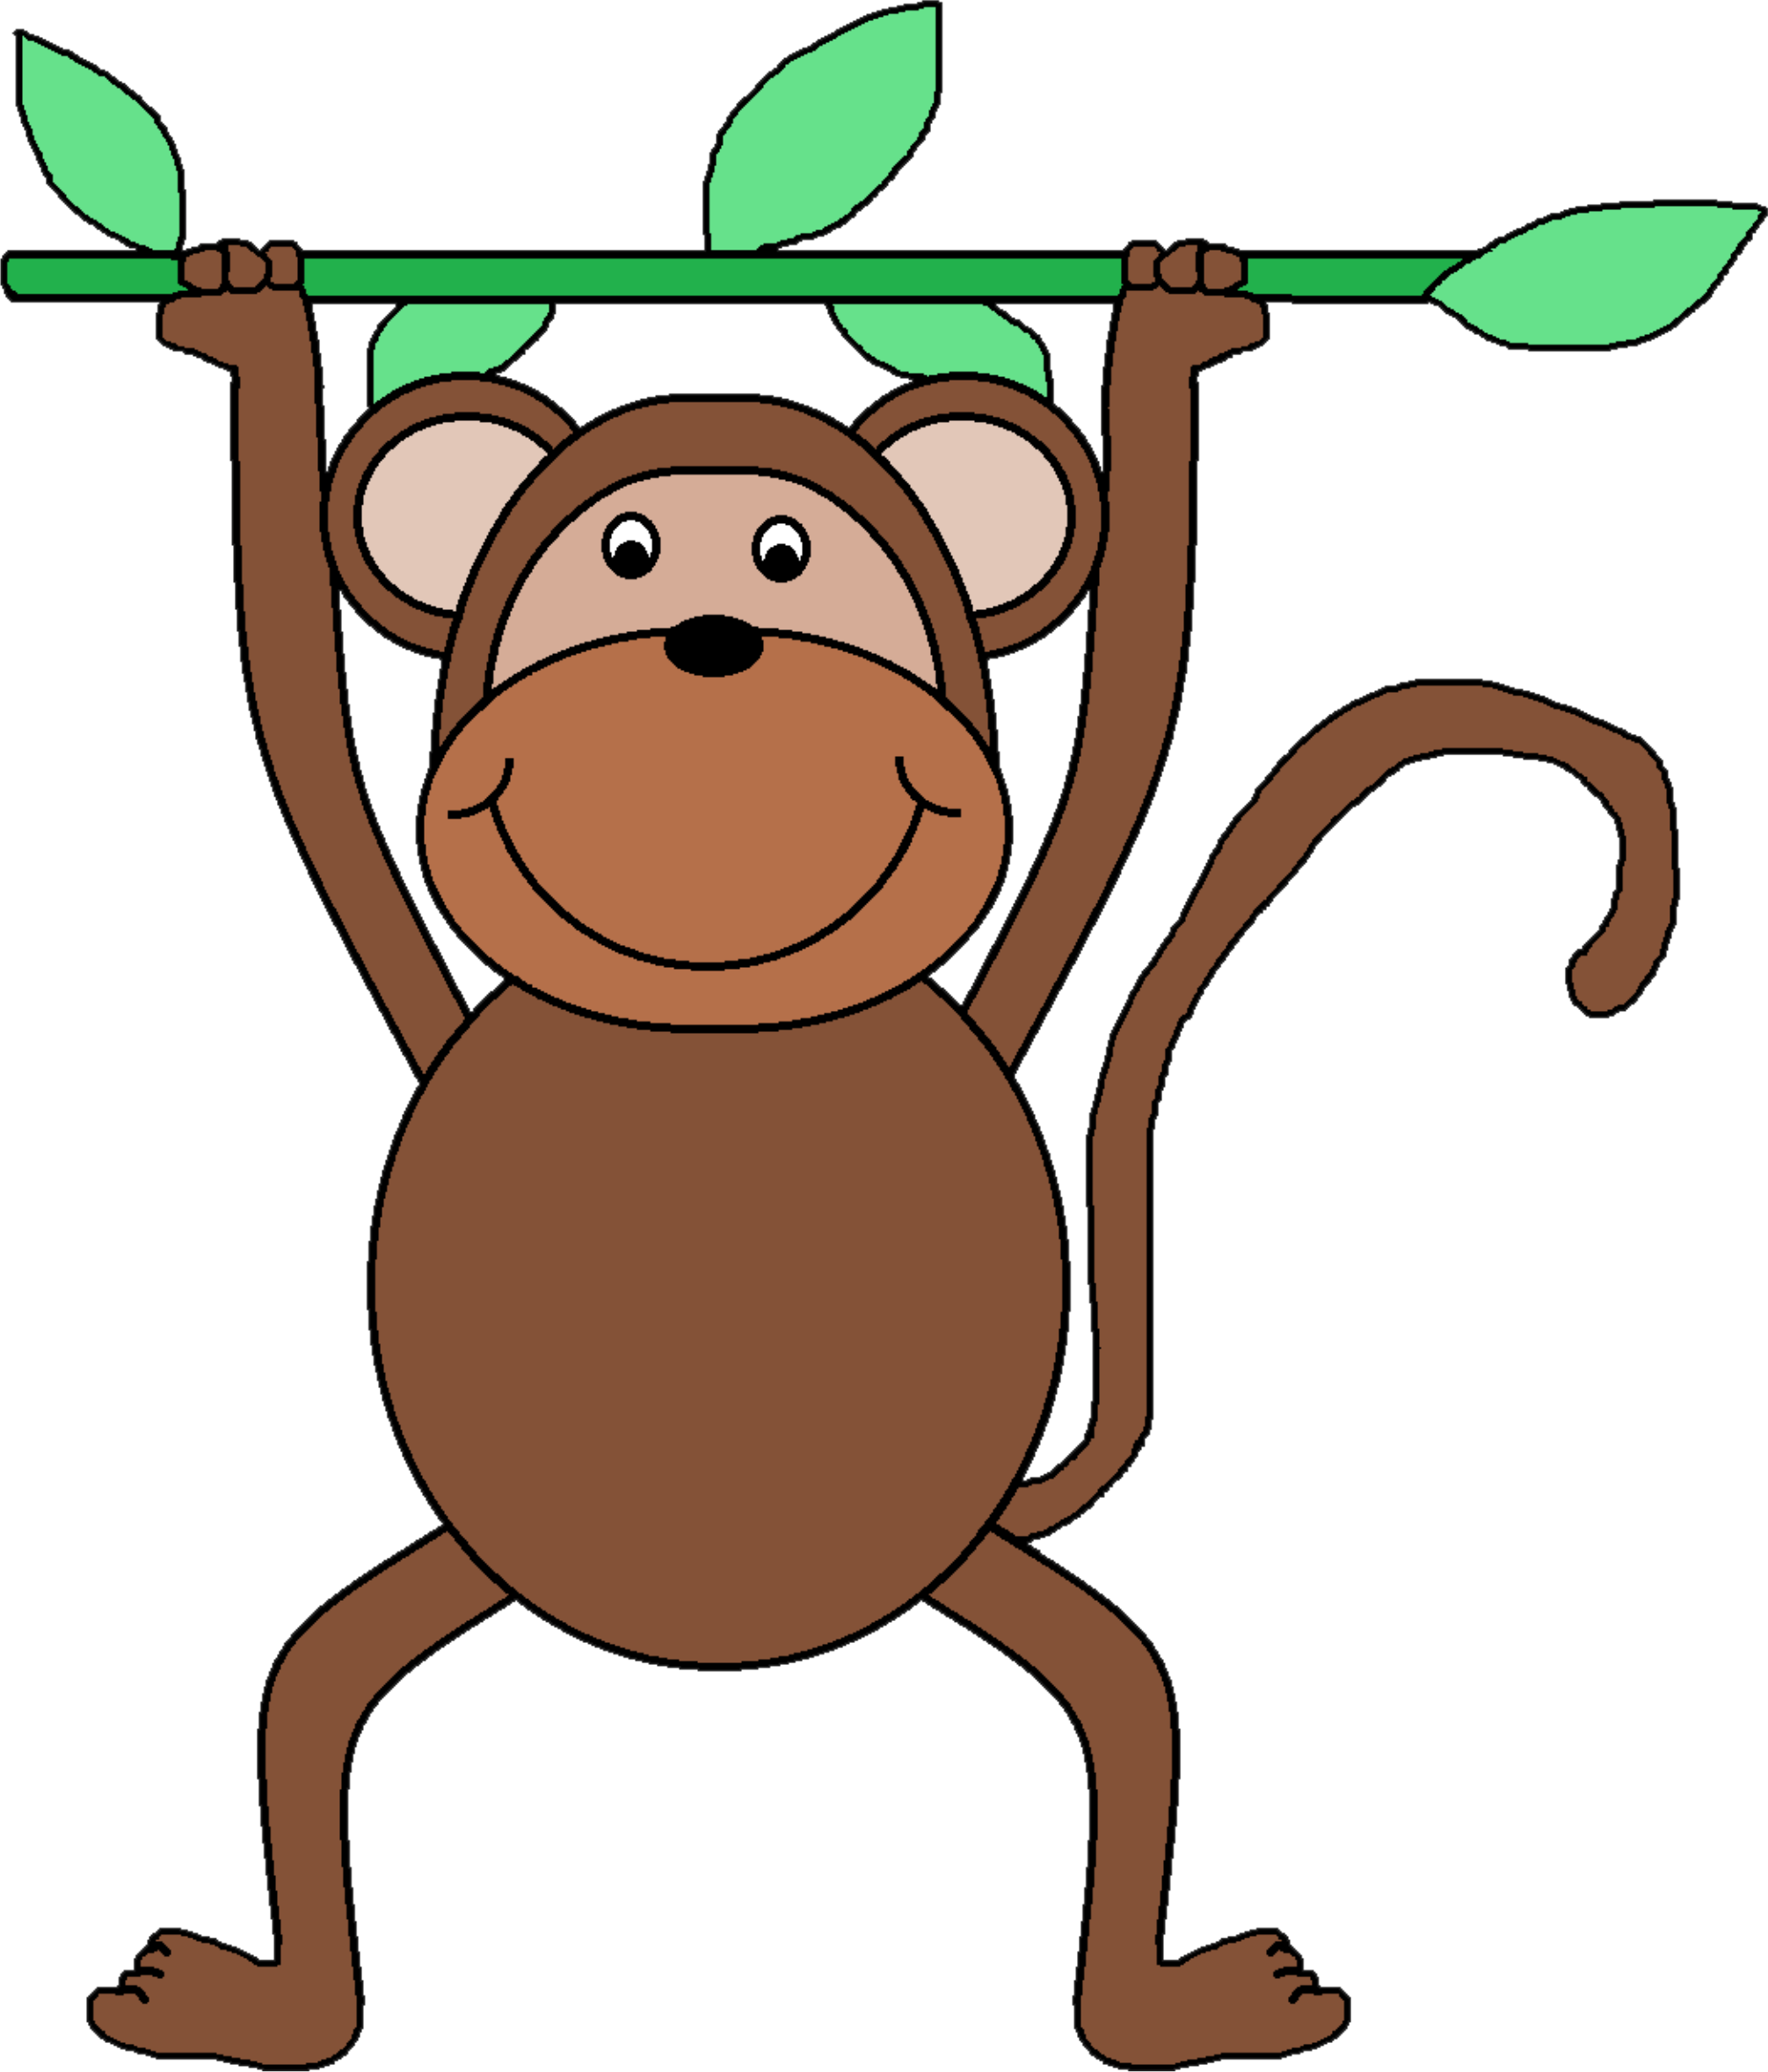 Clipart animals monkey. Clip art big image